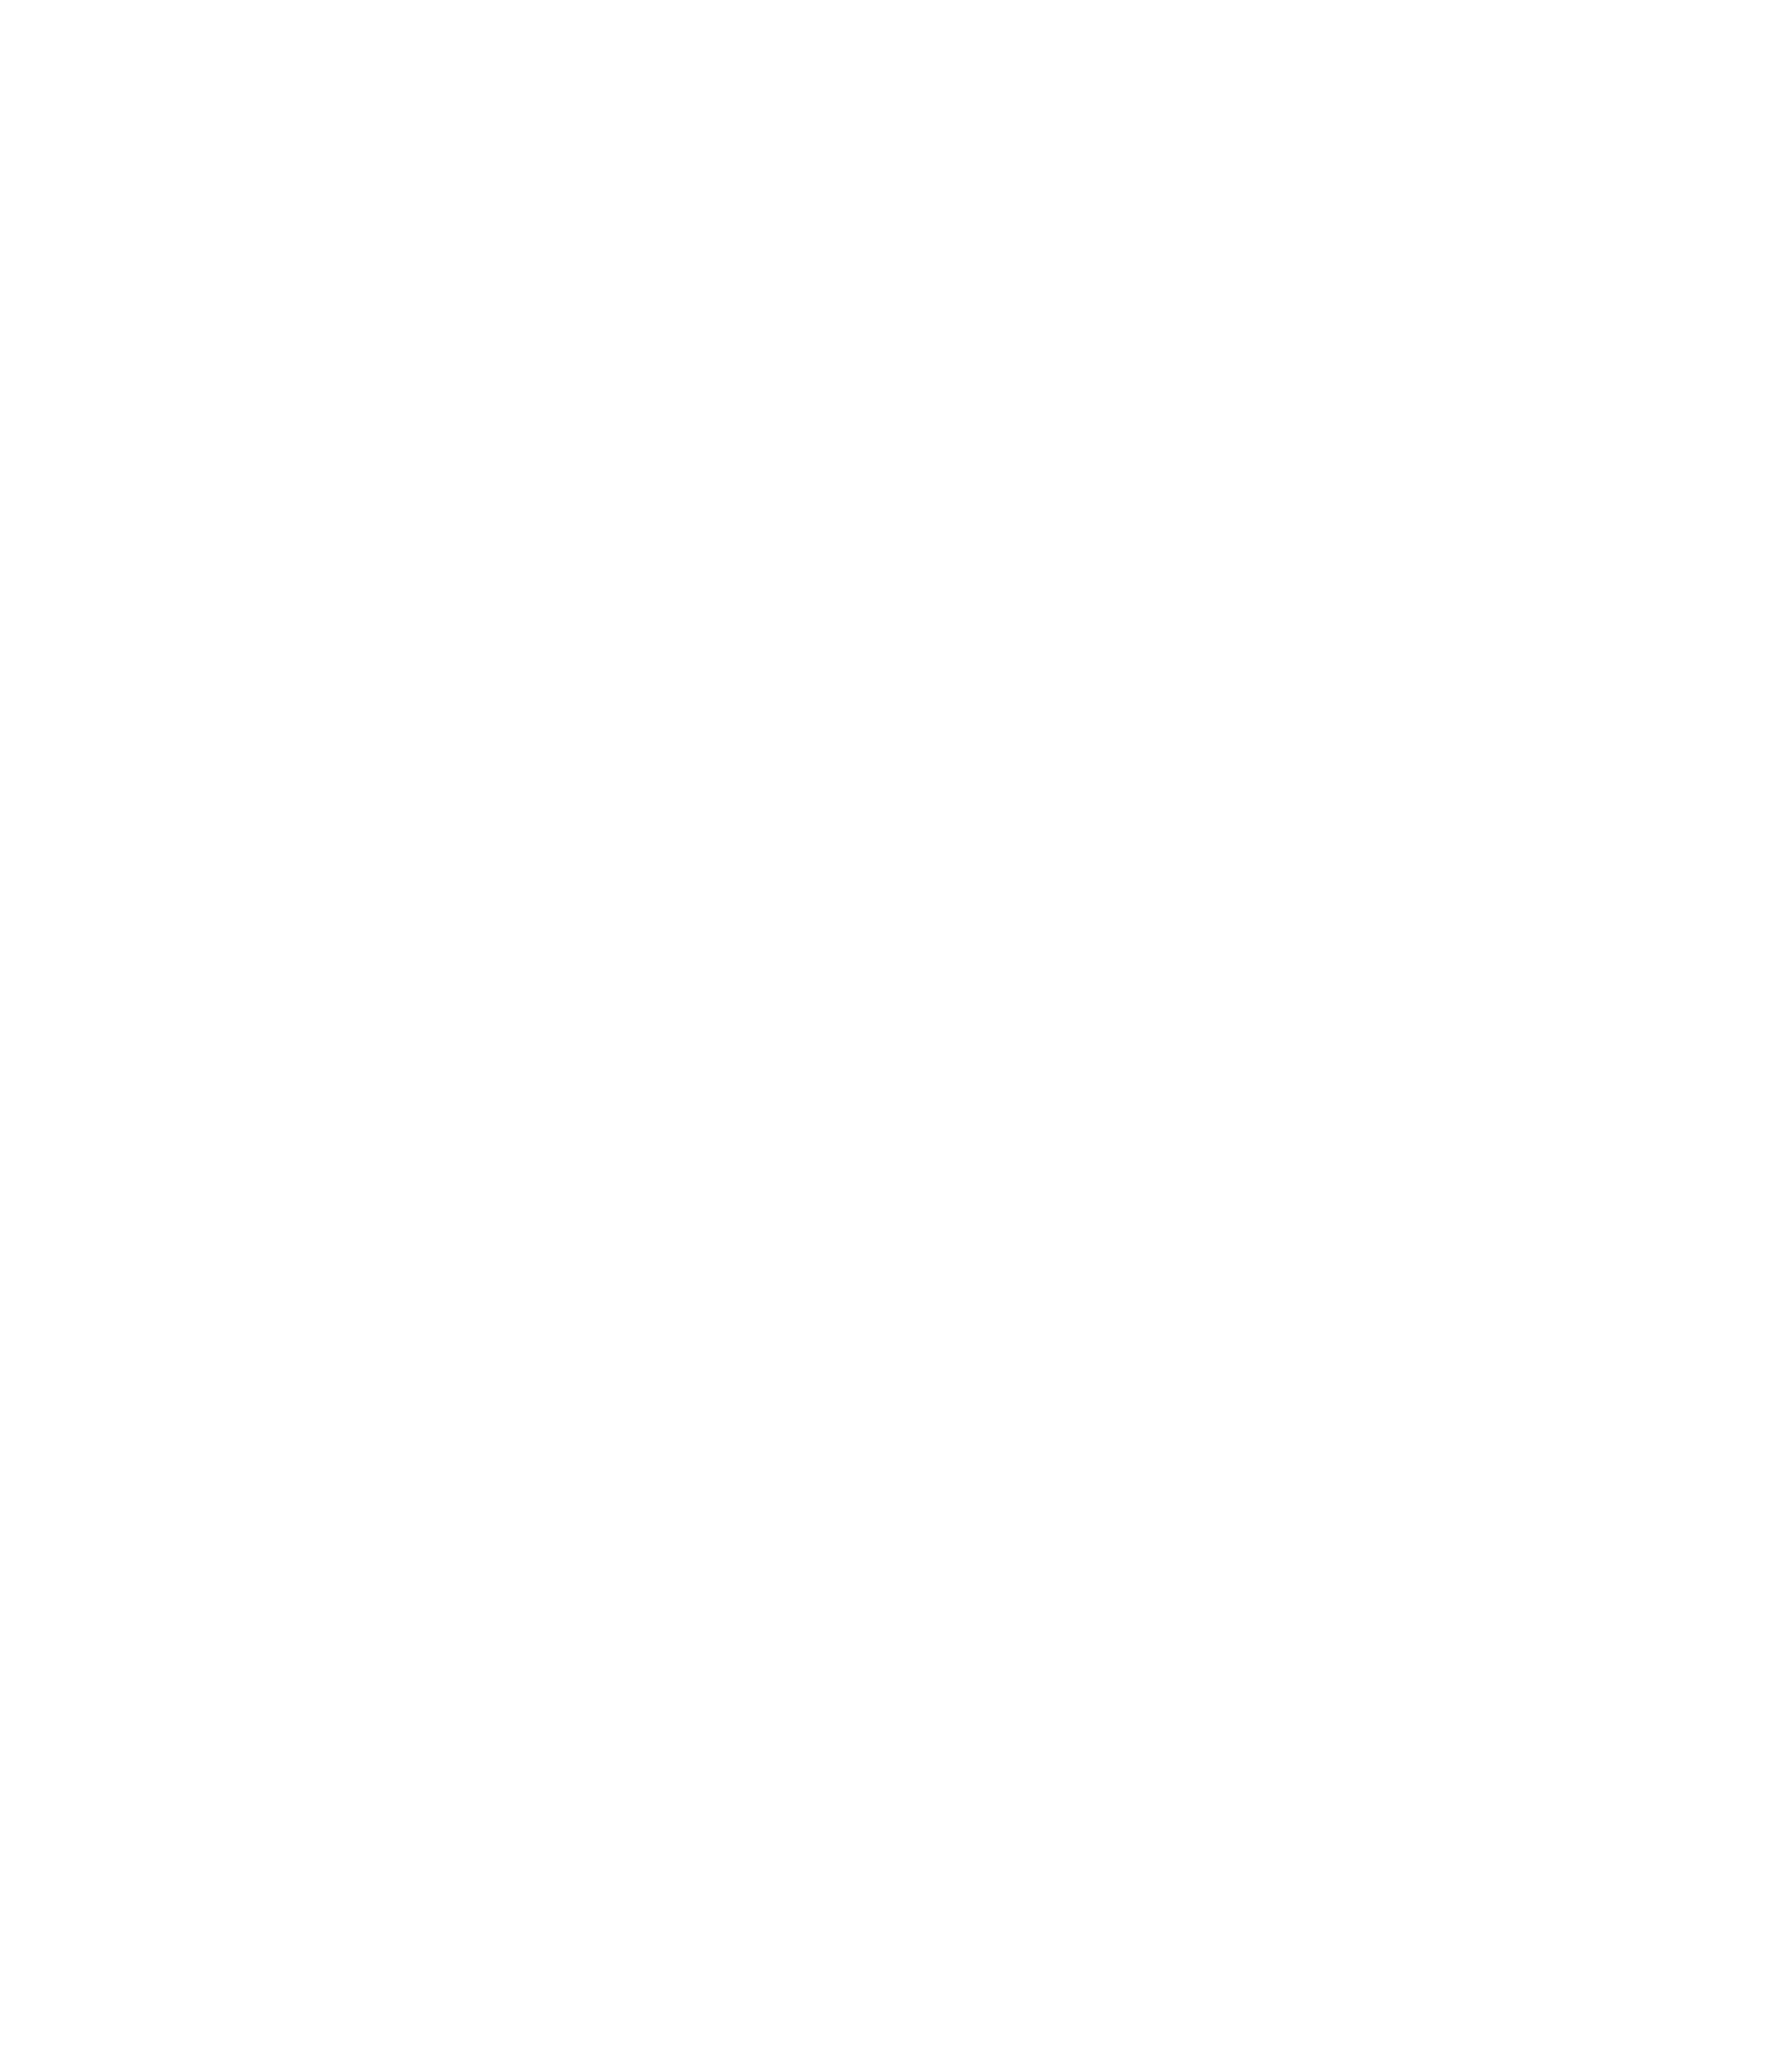 logo sans texte